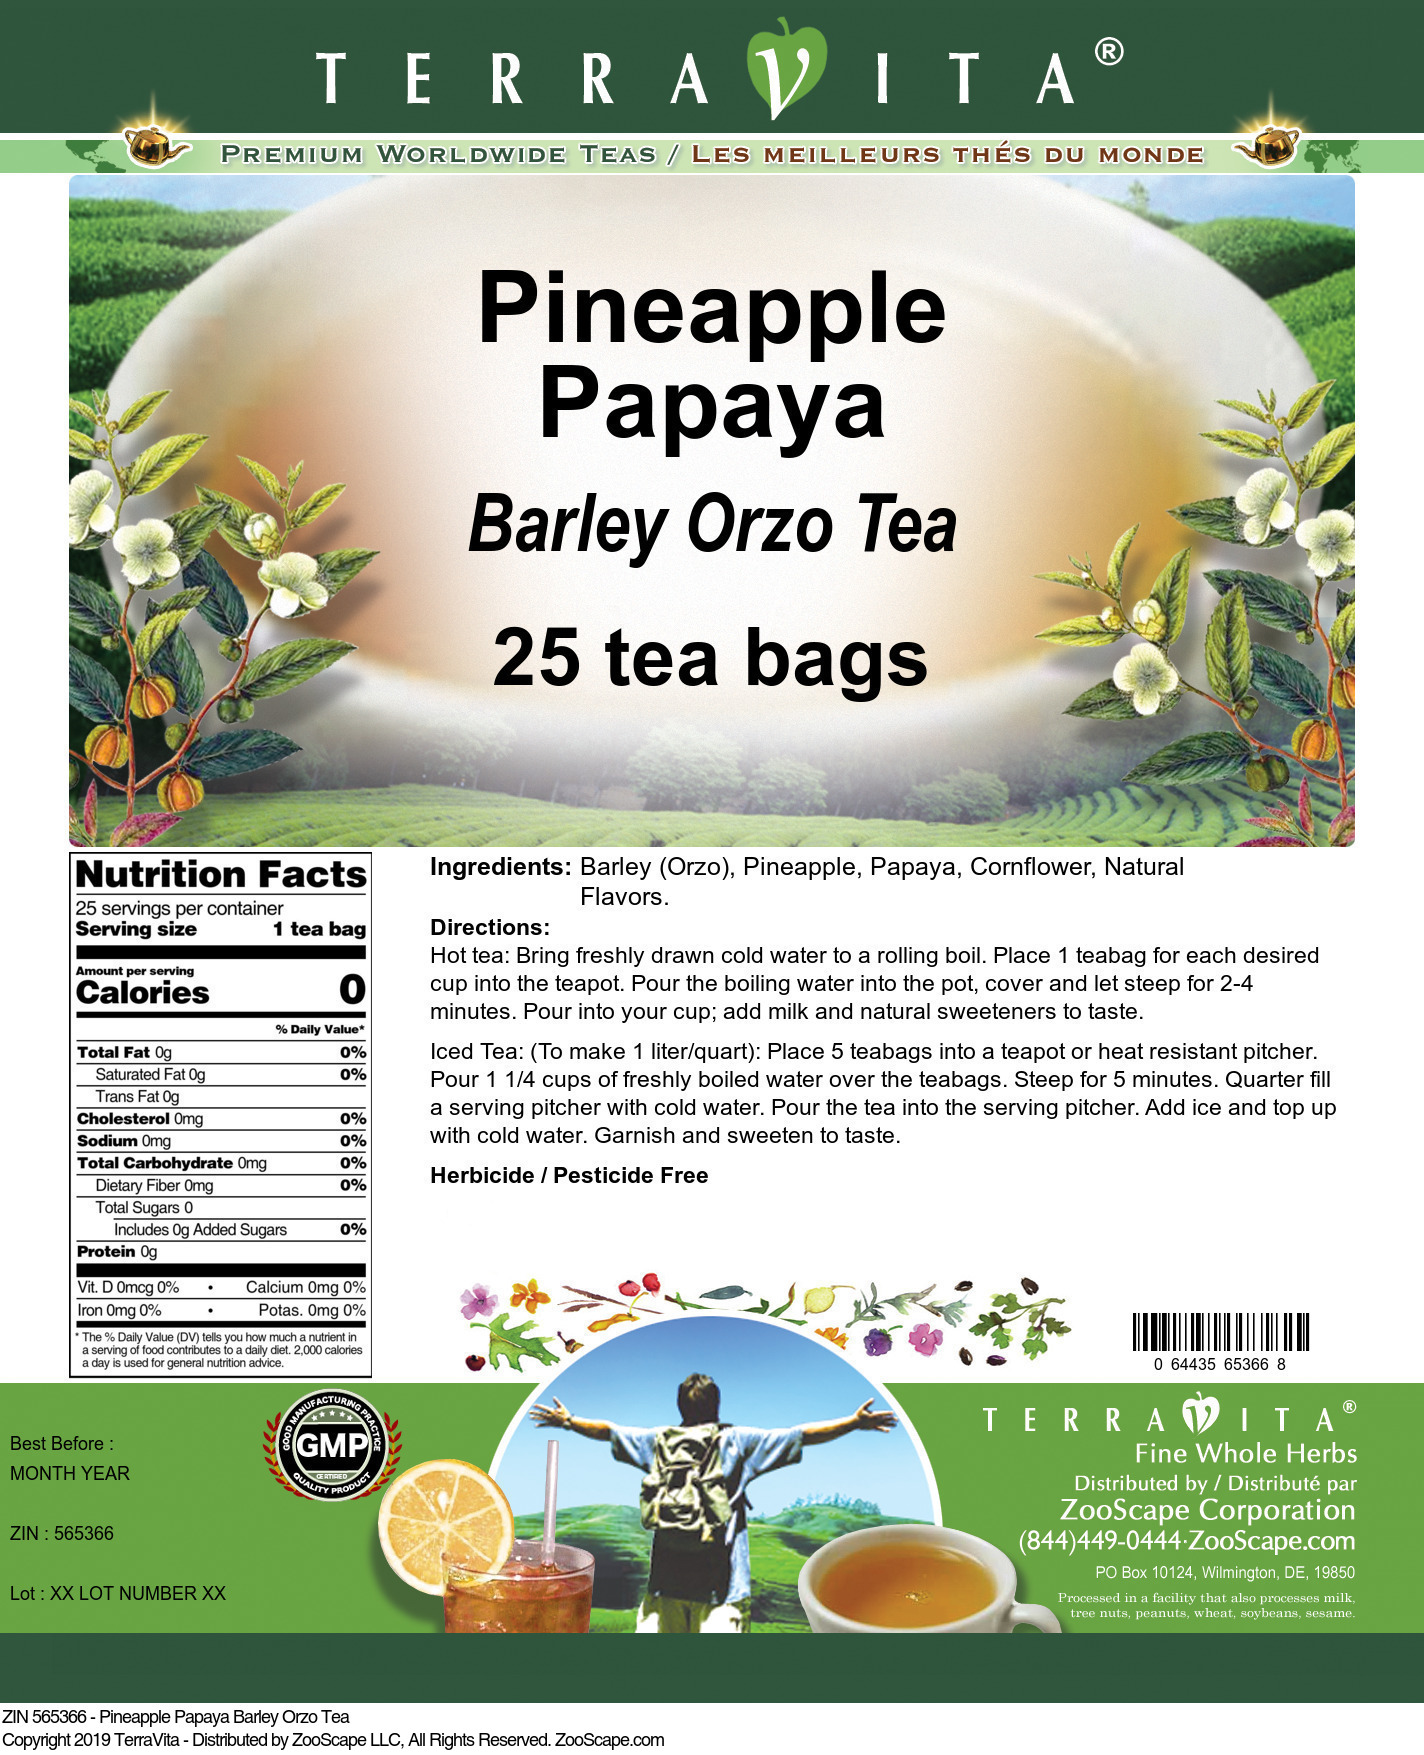 Pineapple Papaya Barley Orzo